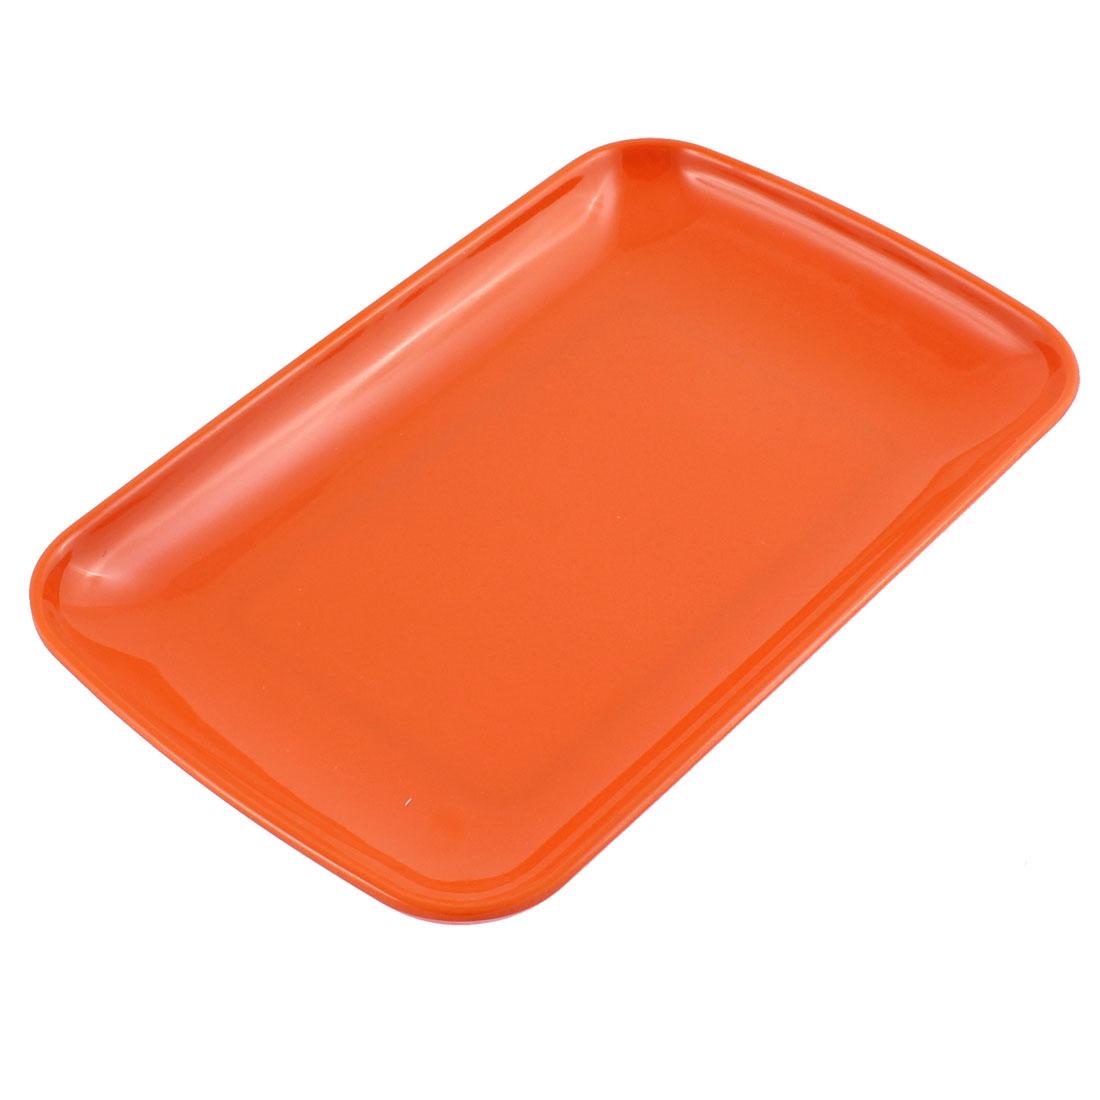 Plastic Rectangle Shaped Dinner Dessert Vermicelli Snack Plate Dish Orangered